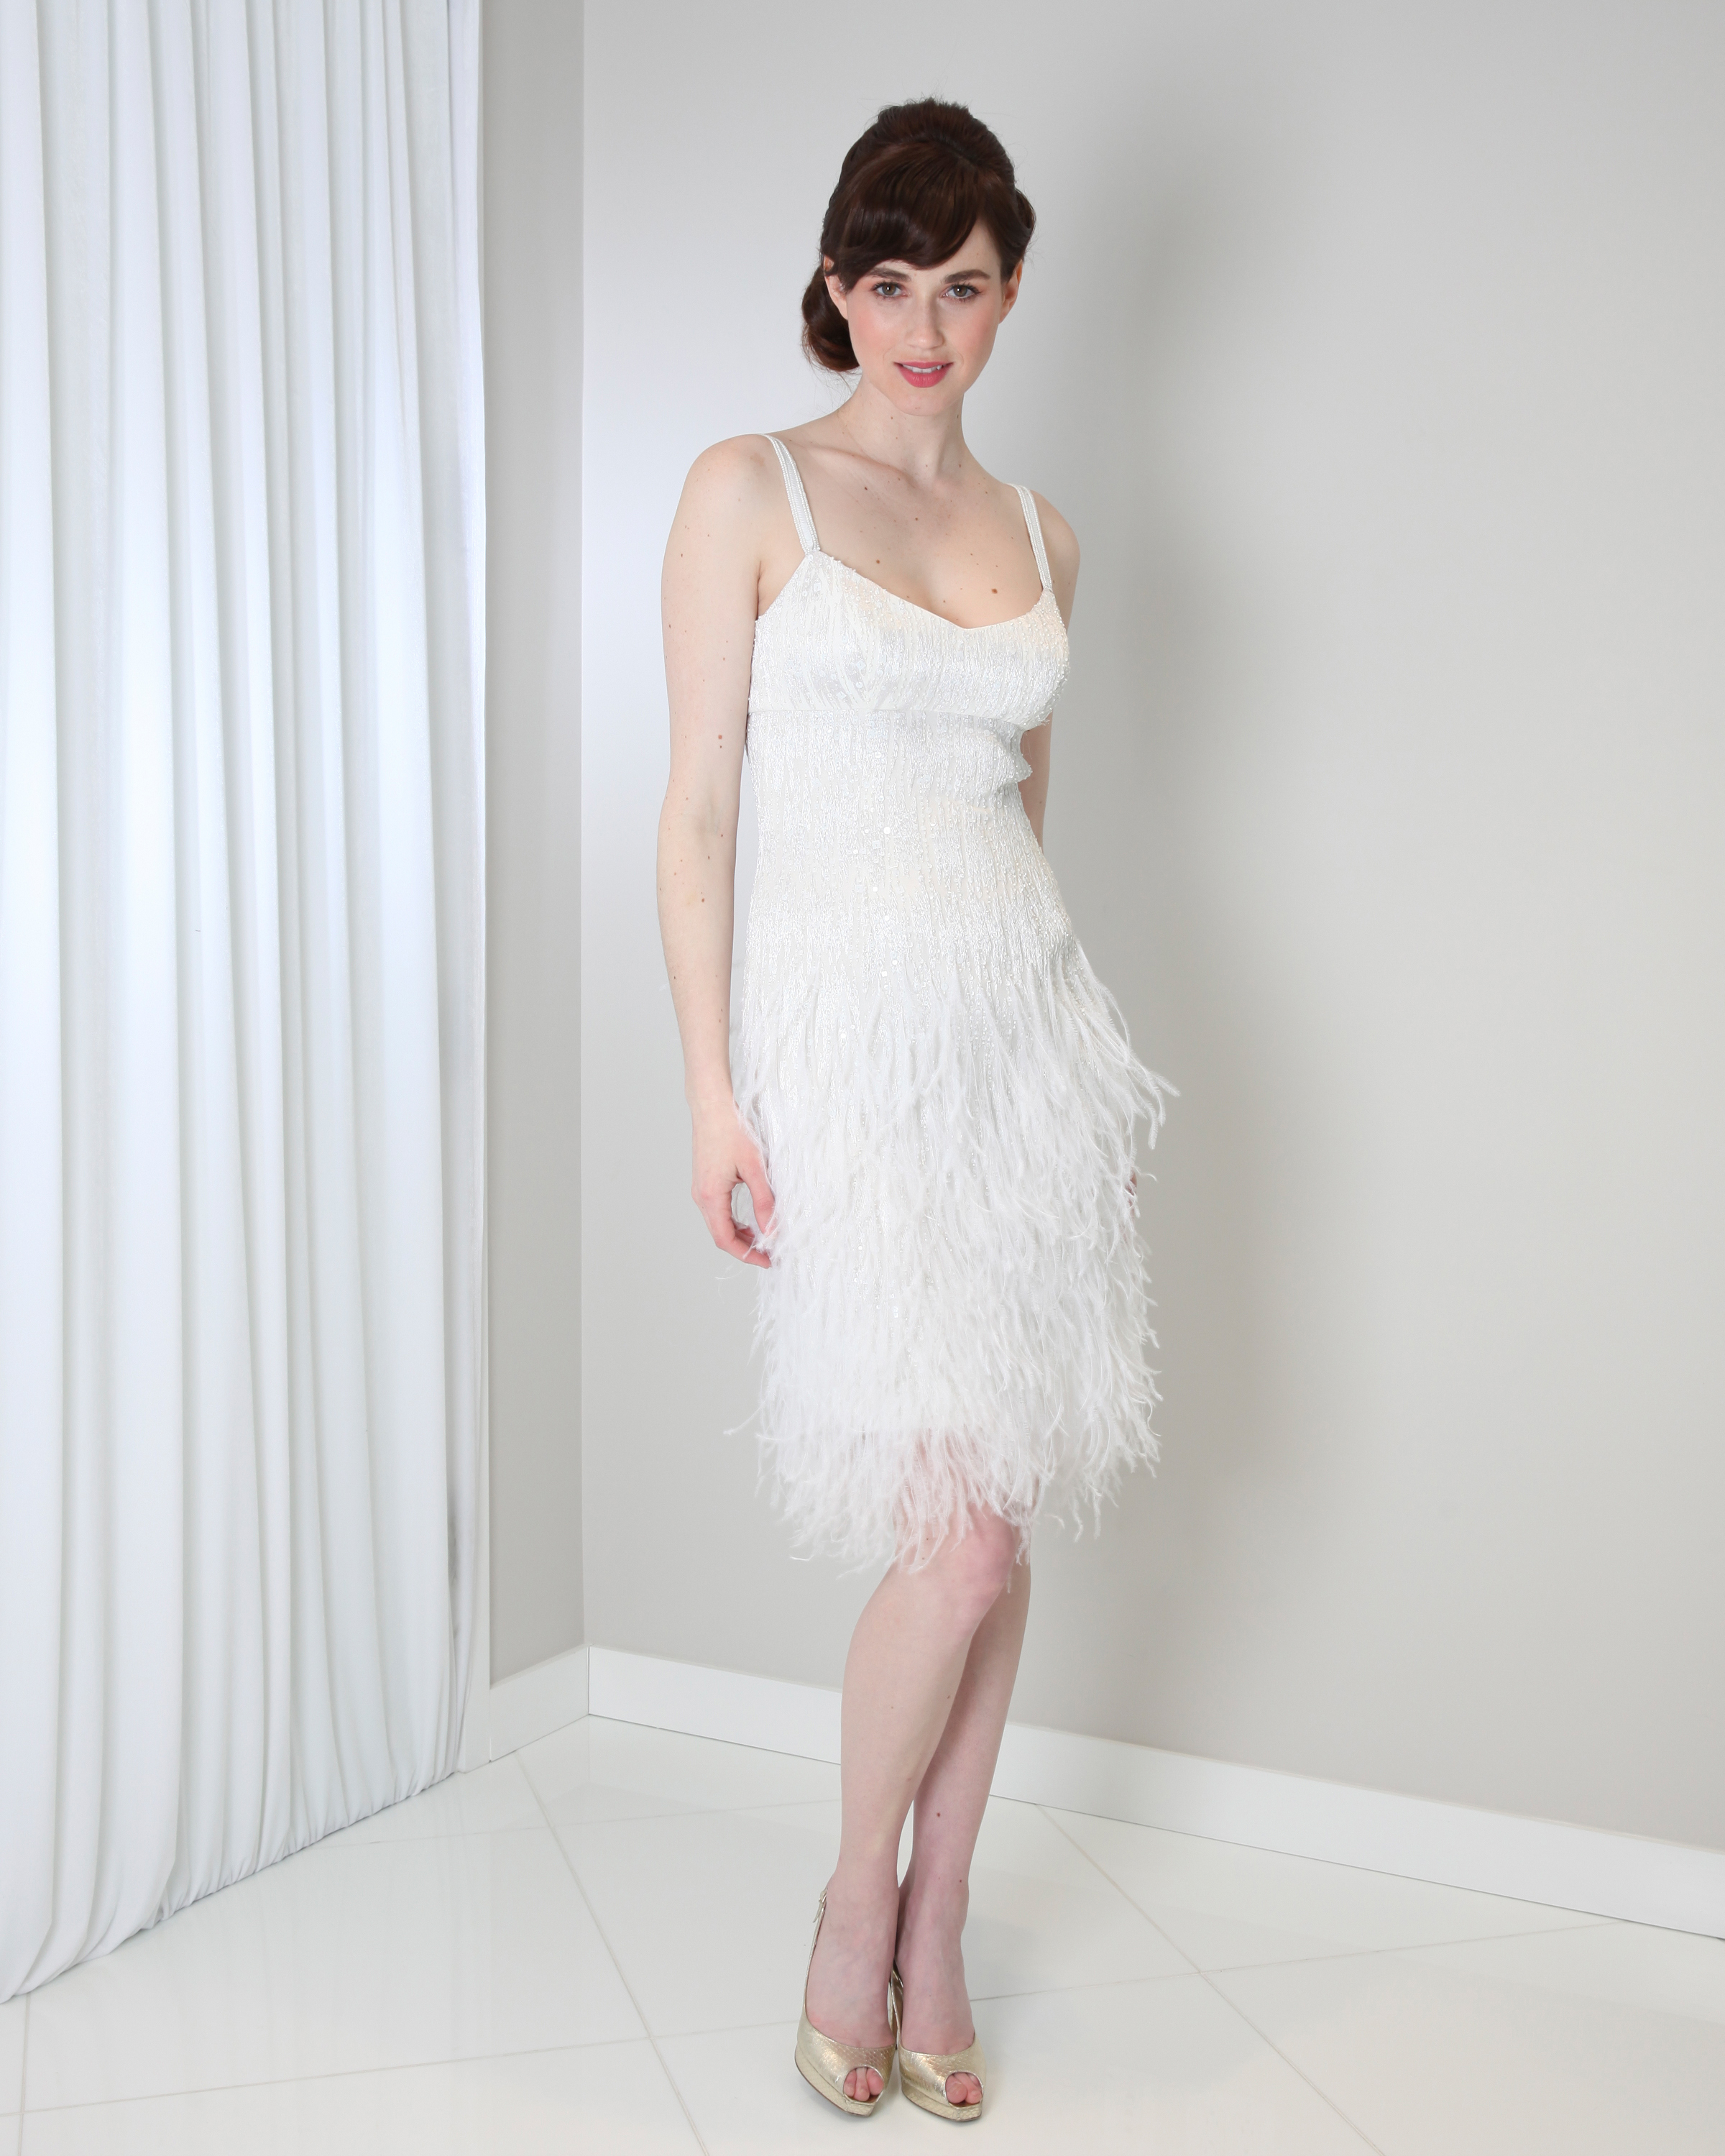 randi-rahm-spring2016-flapper-cocktail-dress-0415.jpg